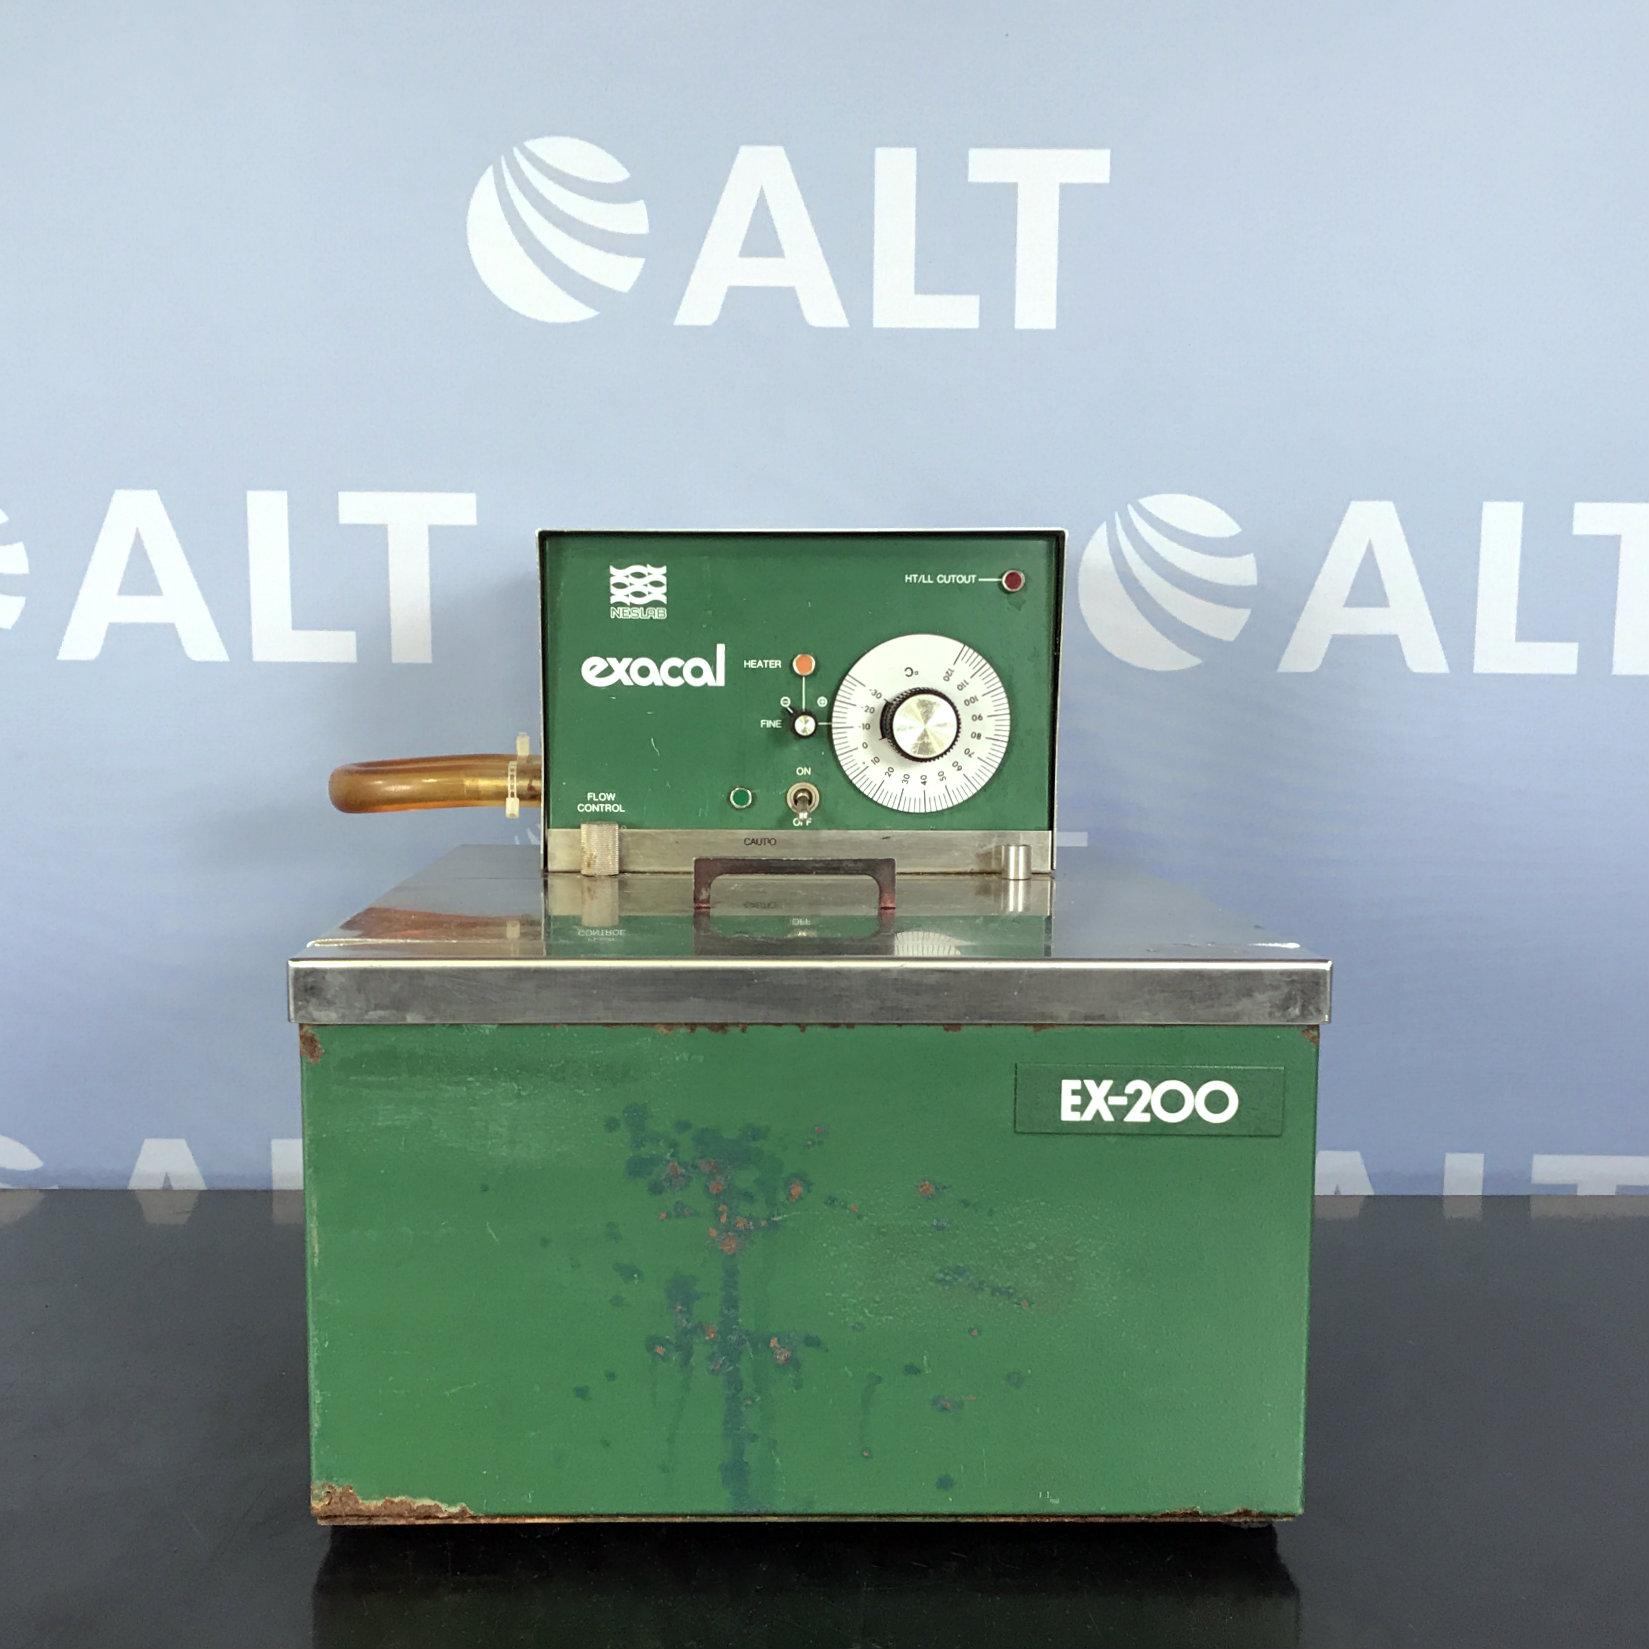 Neslab EX-200 Recirculating Chiller Image